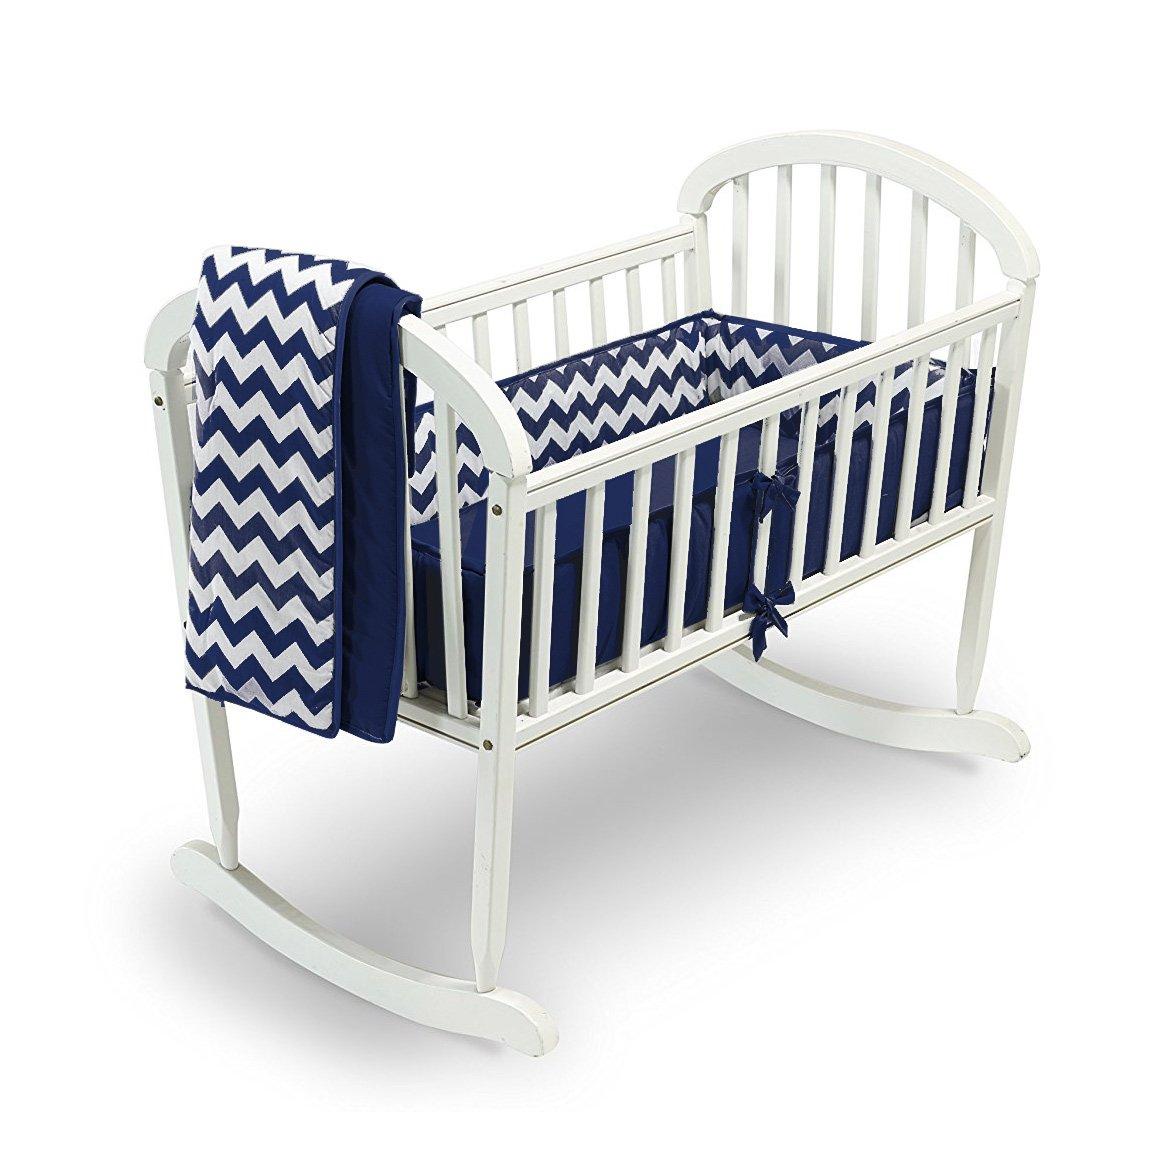 Babykidsbargains Chevron Cradle Bedding, Navy, 18'' x 36''